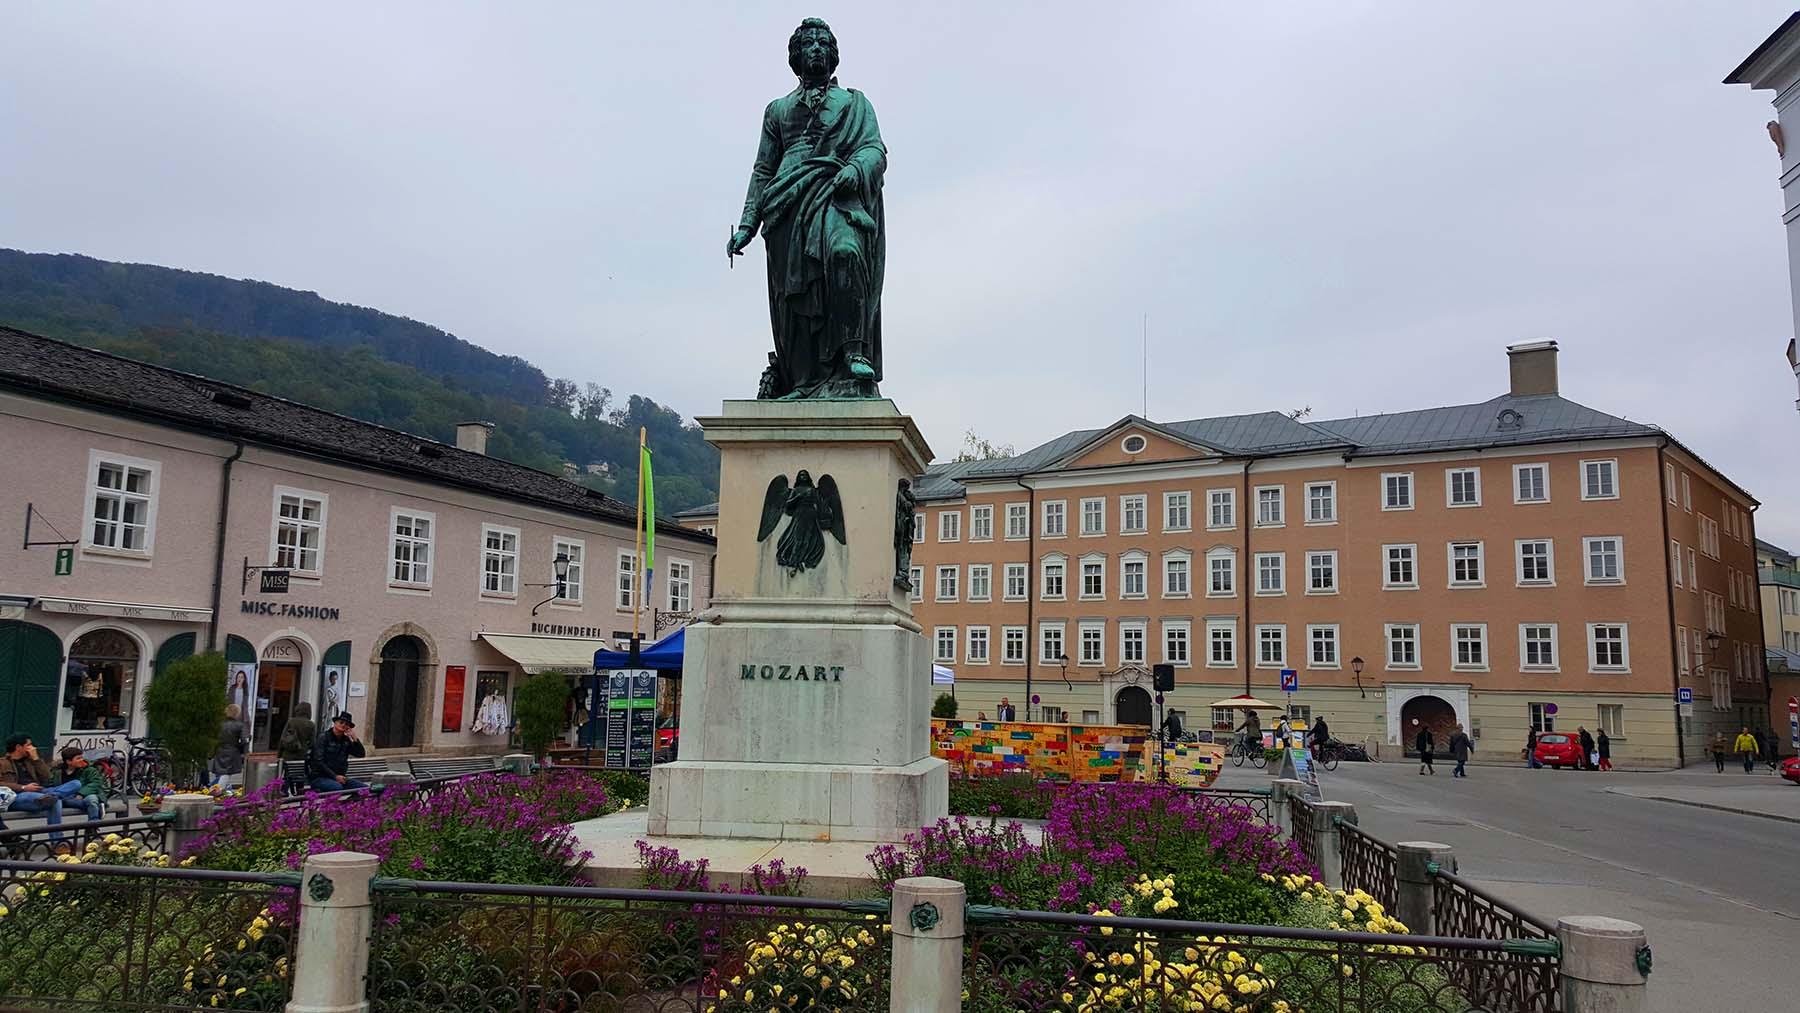 Mozartplatz em Salzburg, Áustria